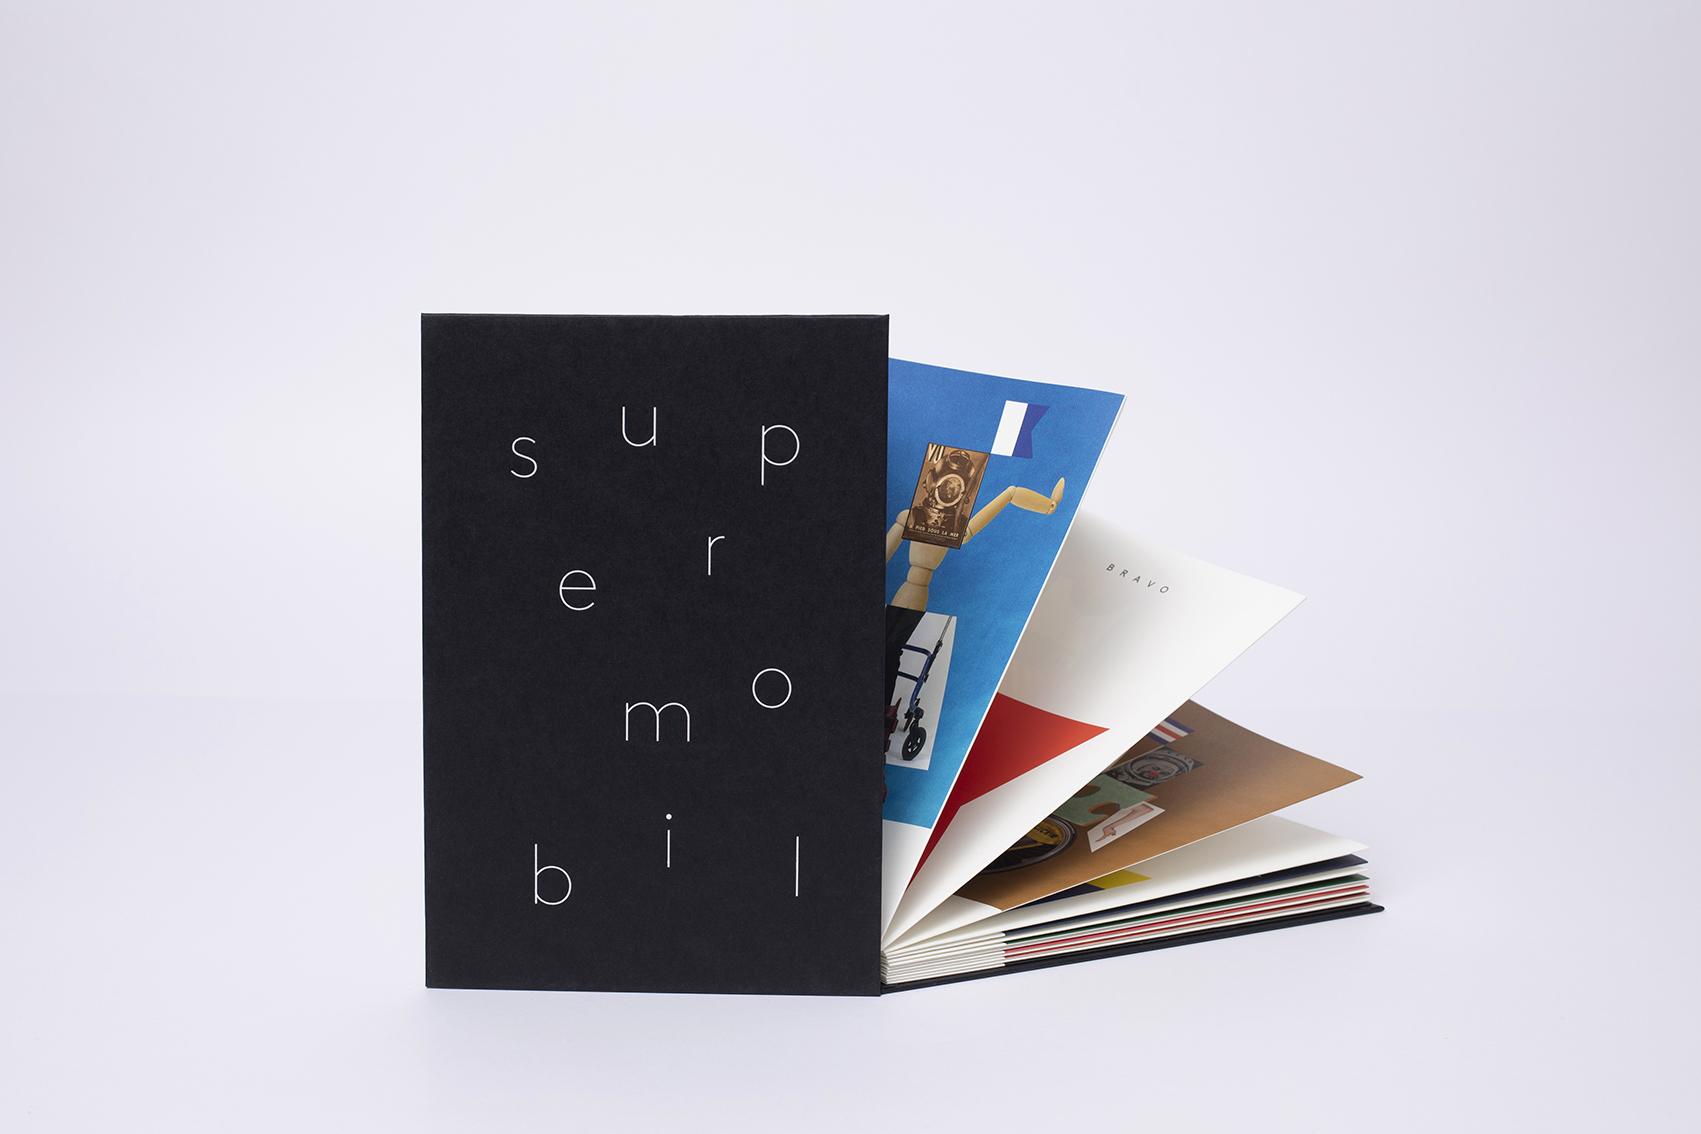 SUPERMOBIL – Leporello – 28 pages RV - 22,5 x 15 cm – Impression Offset - Photographie Ghislain Mirat